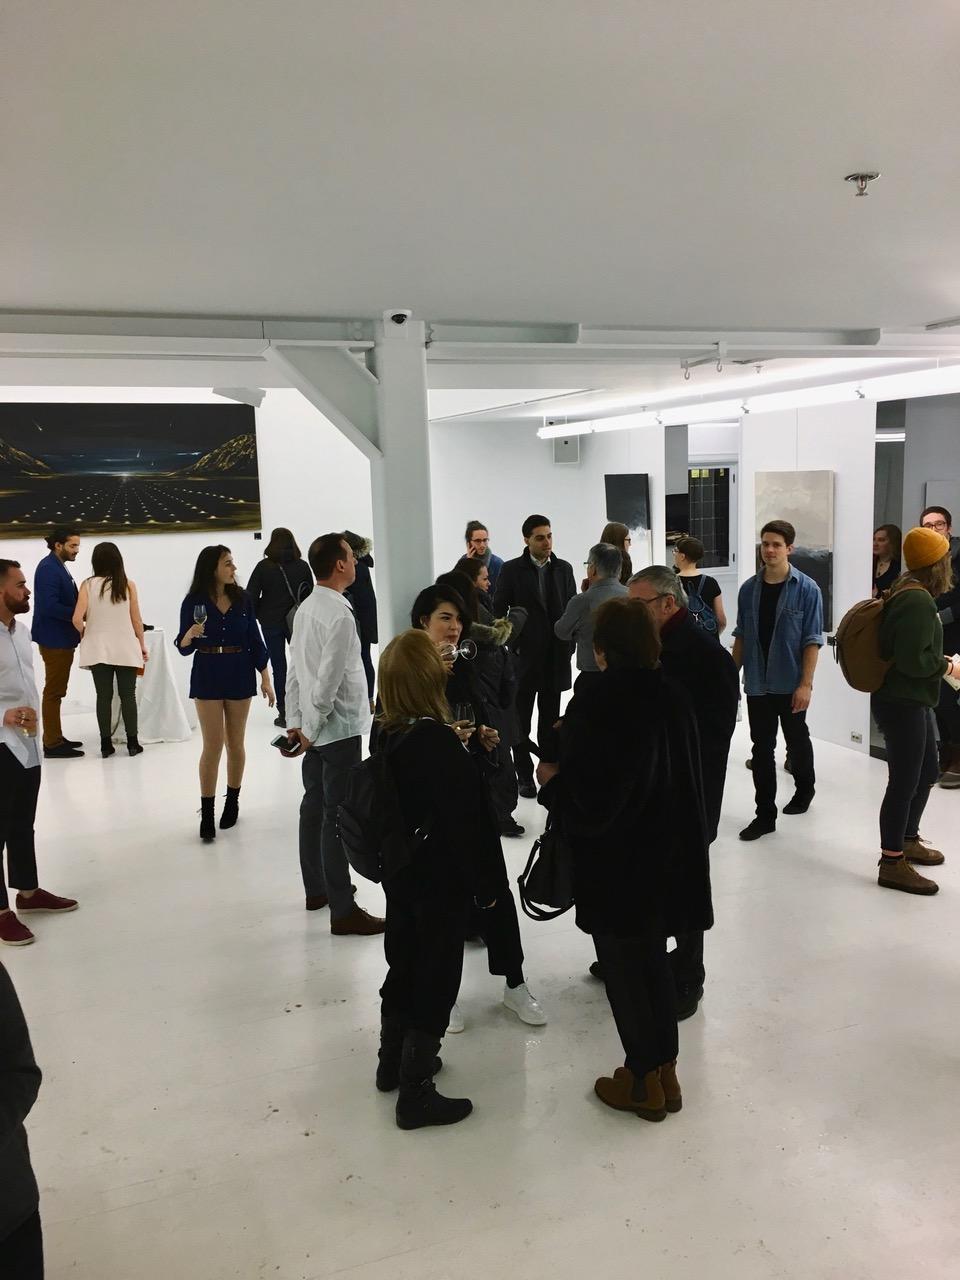 La nouvelle expo Sublime d'Artbangbang